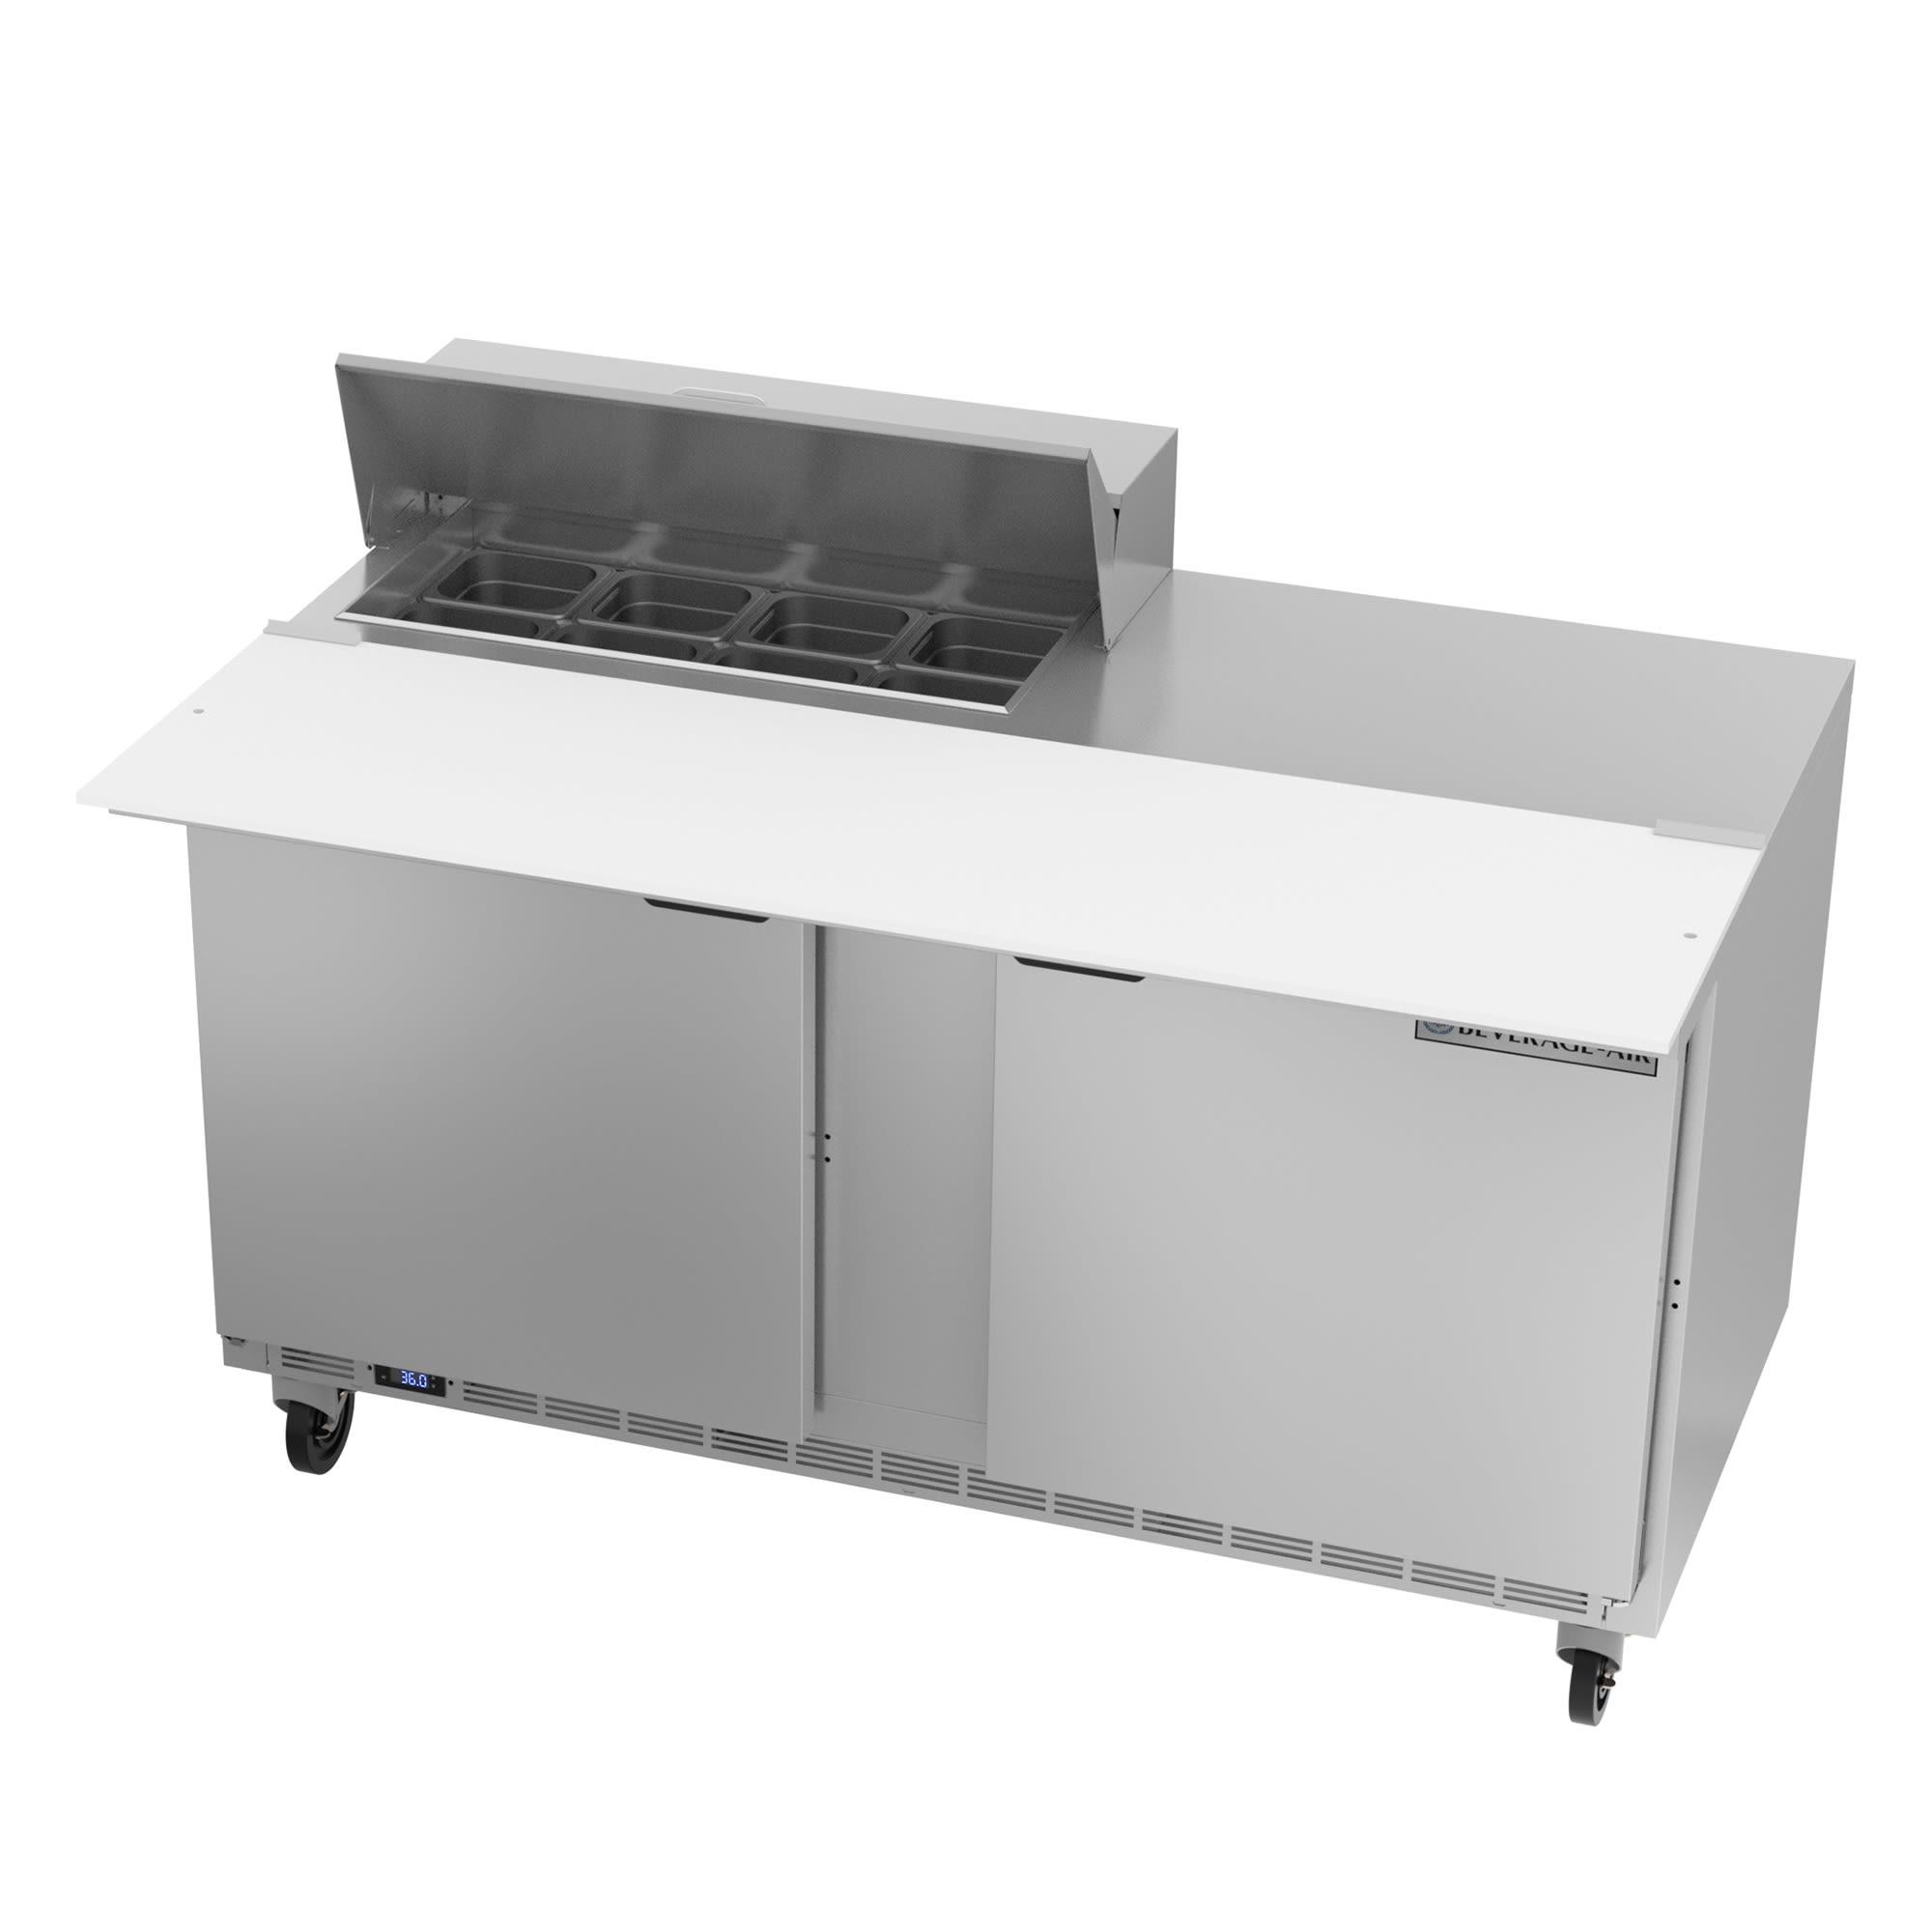 "Beverage Air SPE60HC-08C 60"" Sandwich/Salad Prep Table w/ Refrigerated Base, 115v"